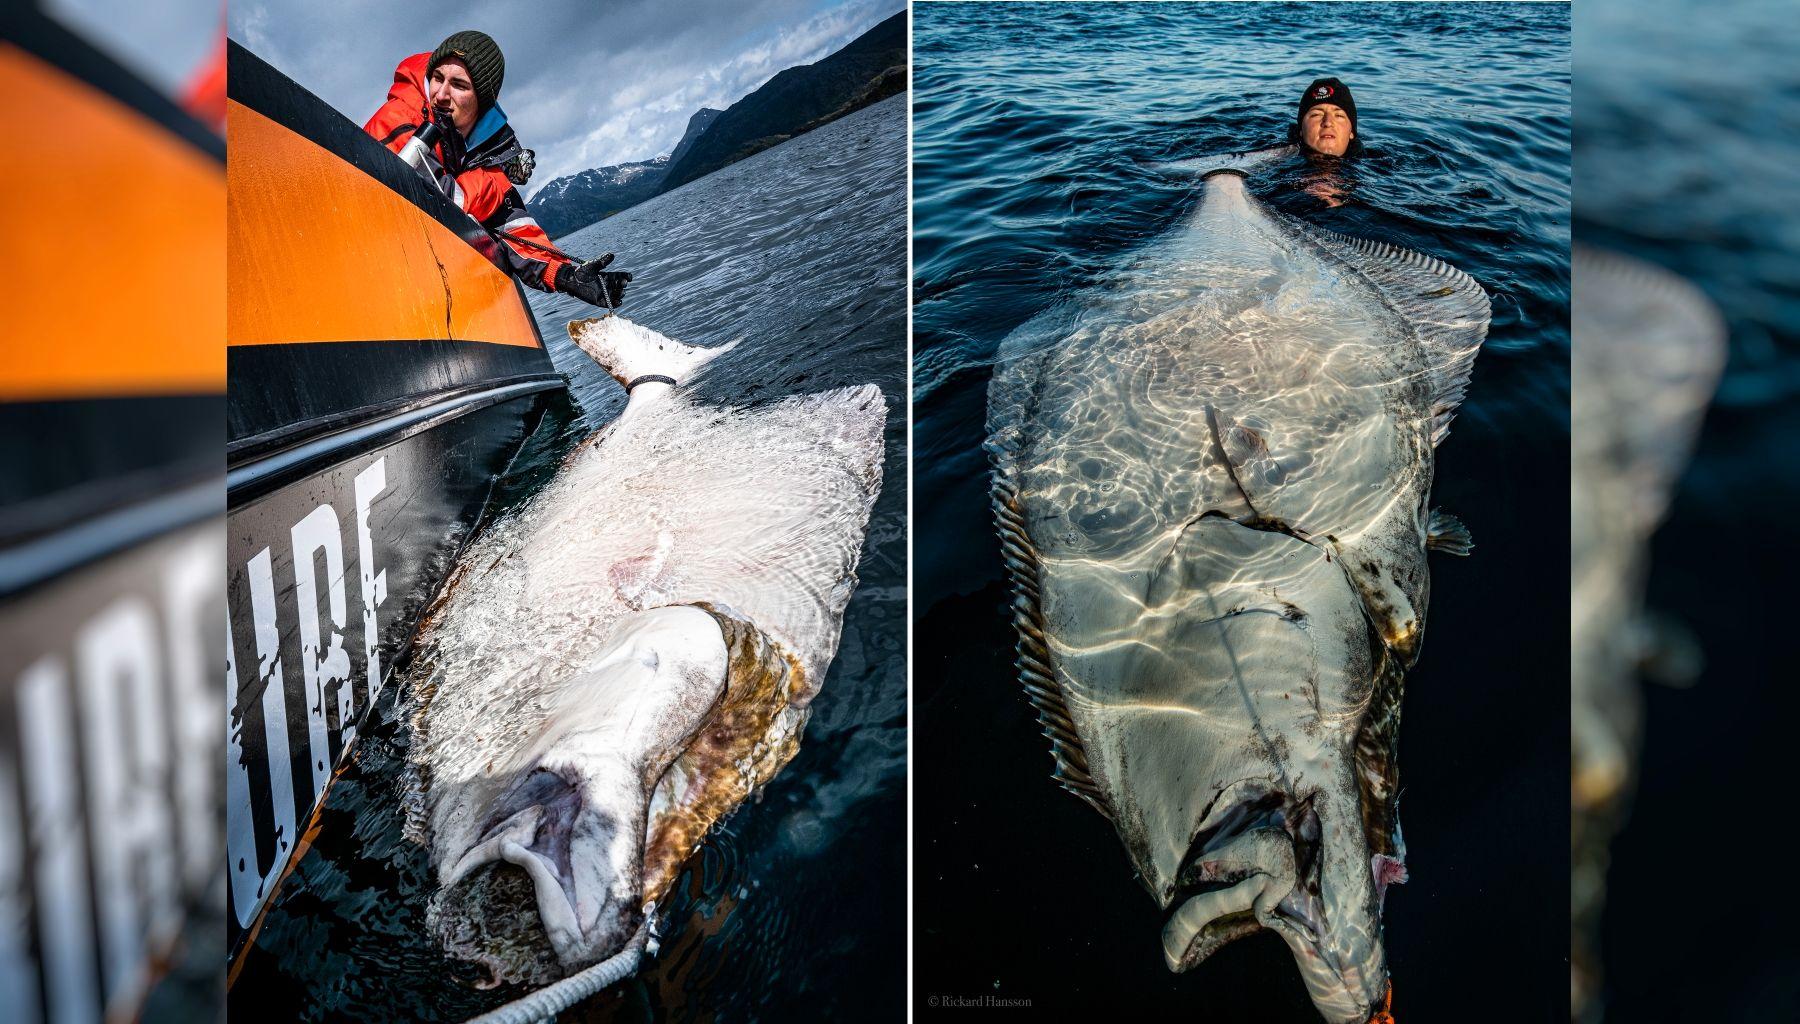 MEGAKVEITE: Det ble fiskelykke for Bilal Saab onsdag ettermiddag.